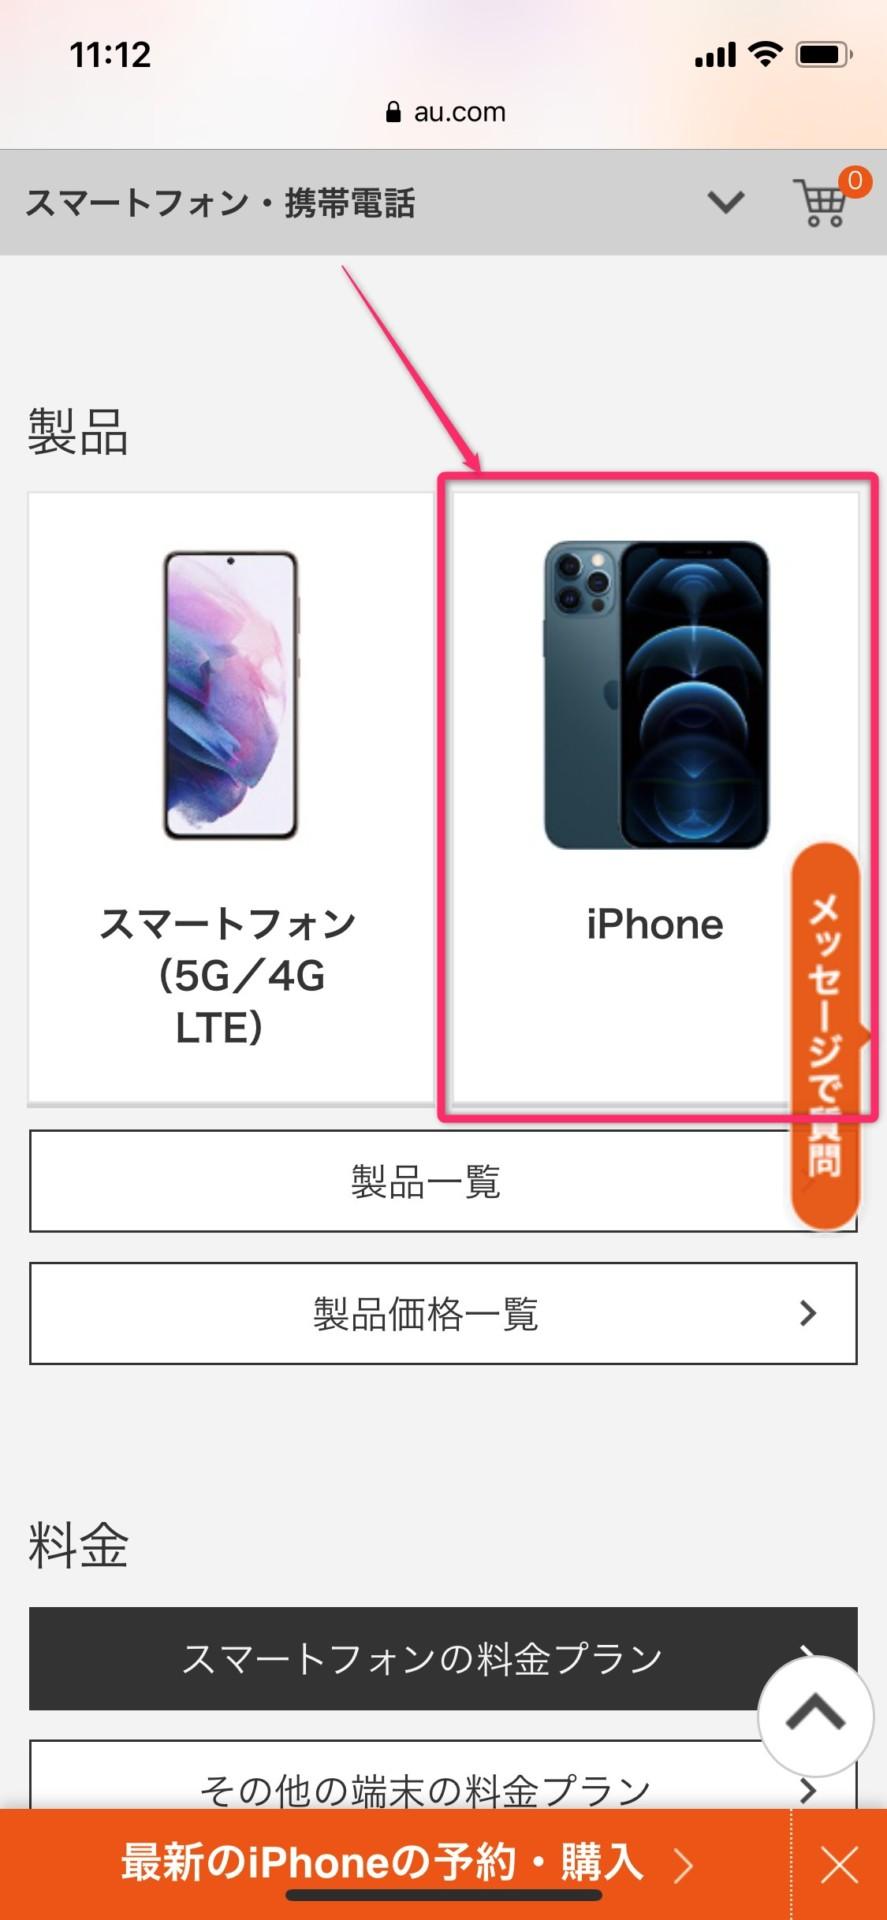 auオンラインショップ公式サイト iphoneの選択